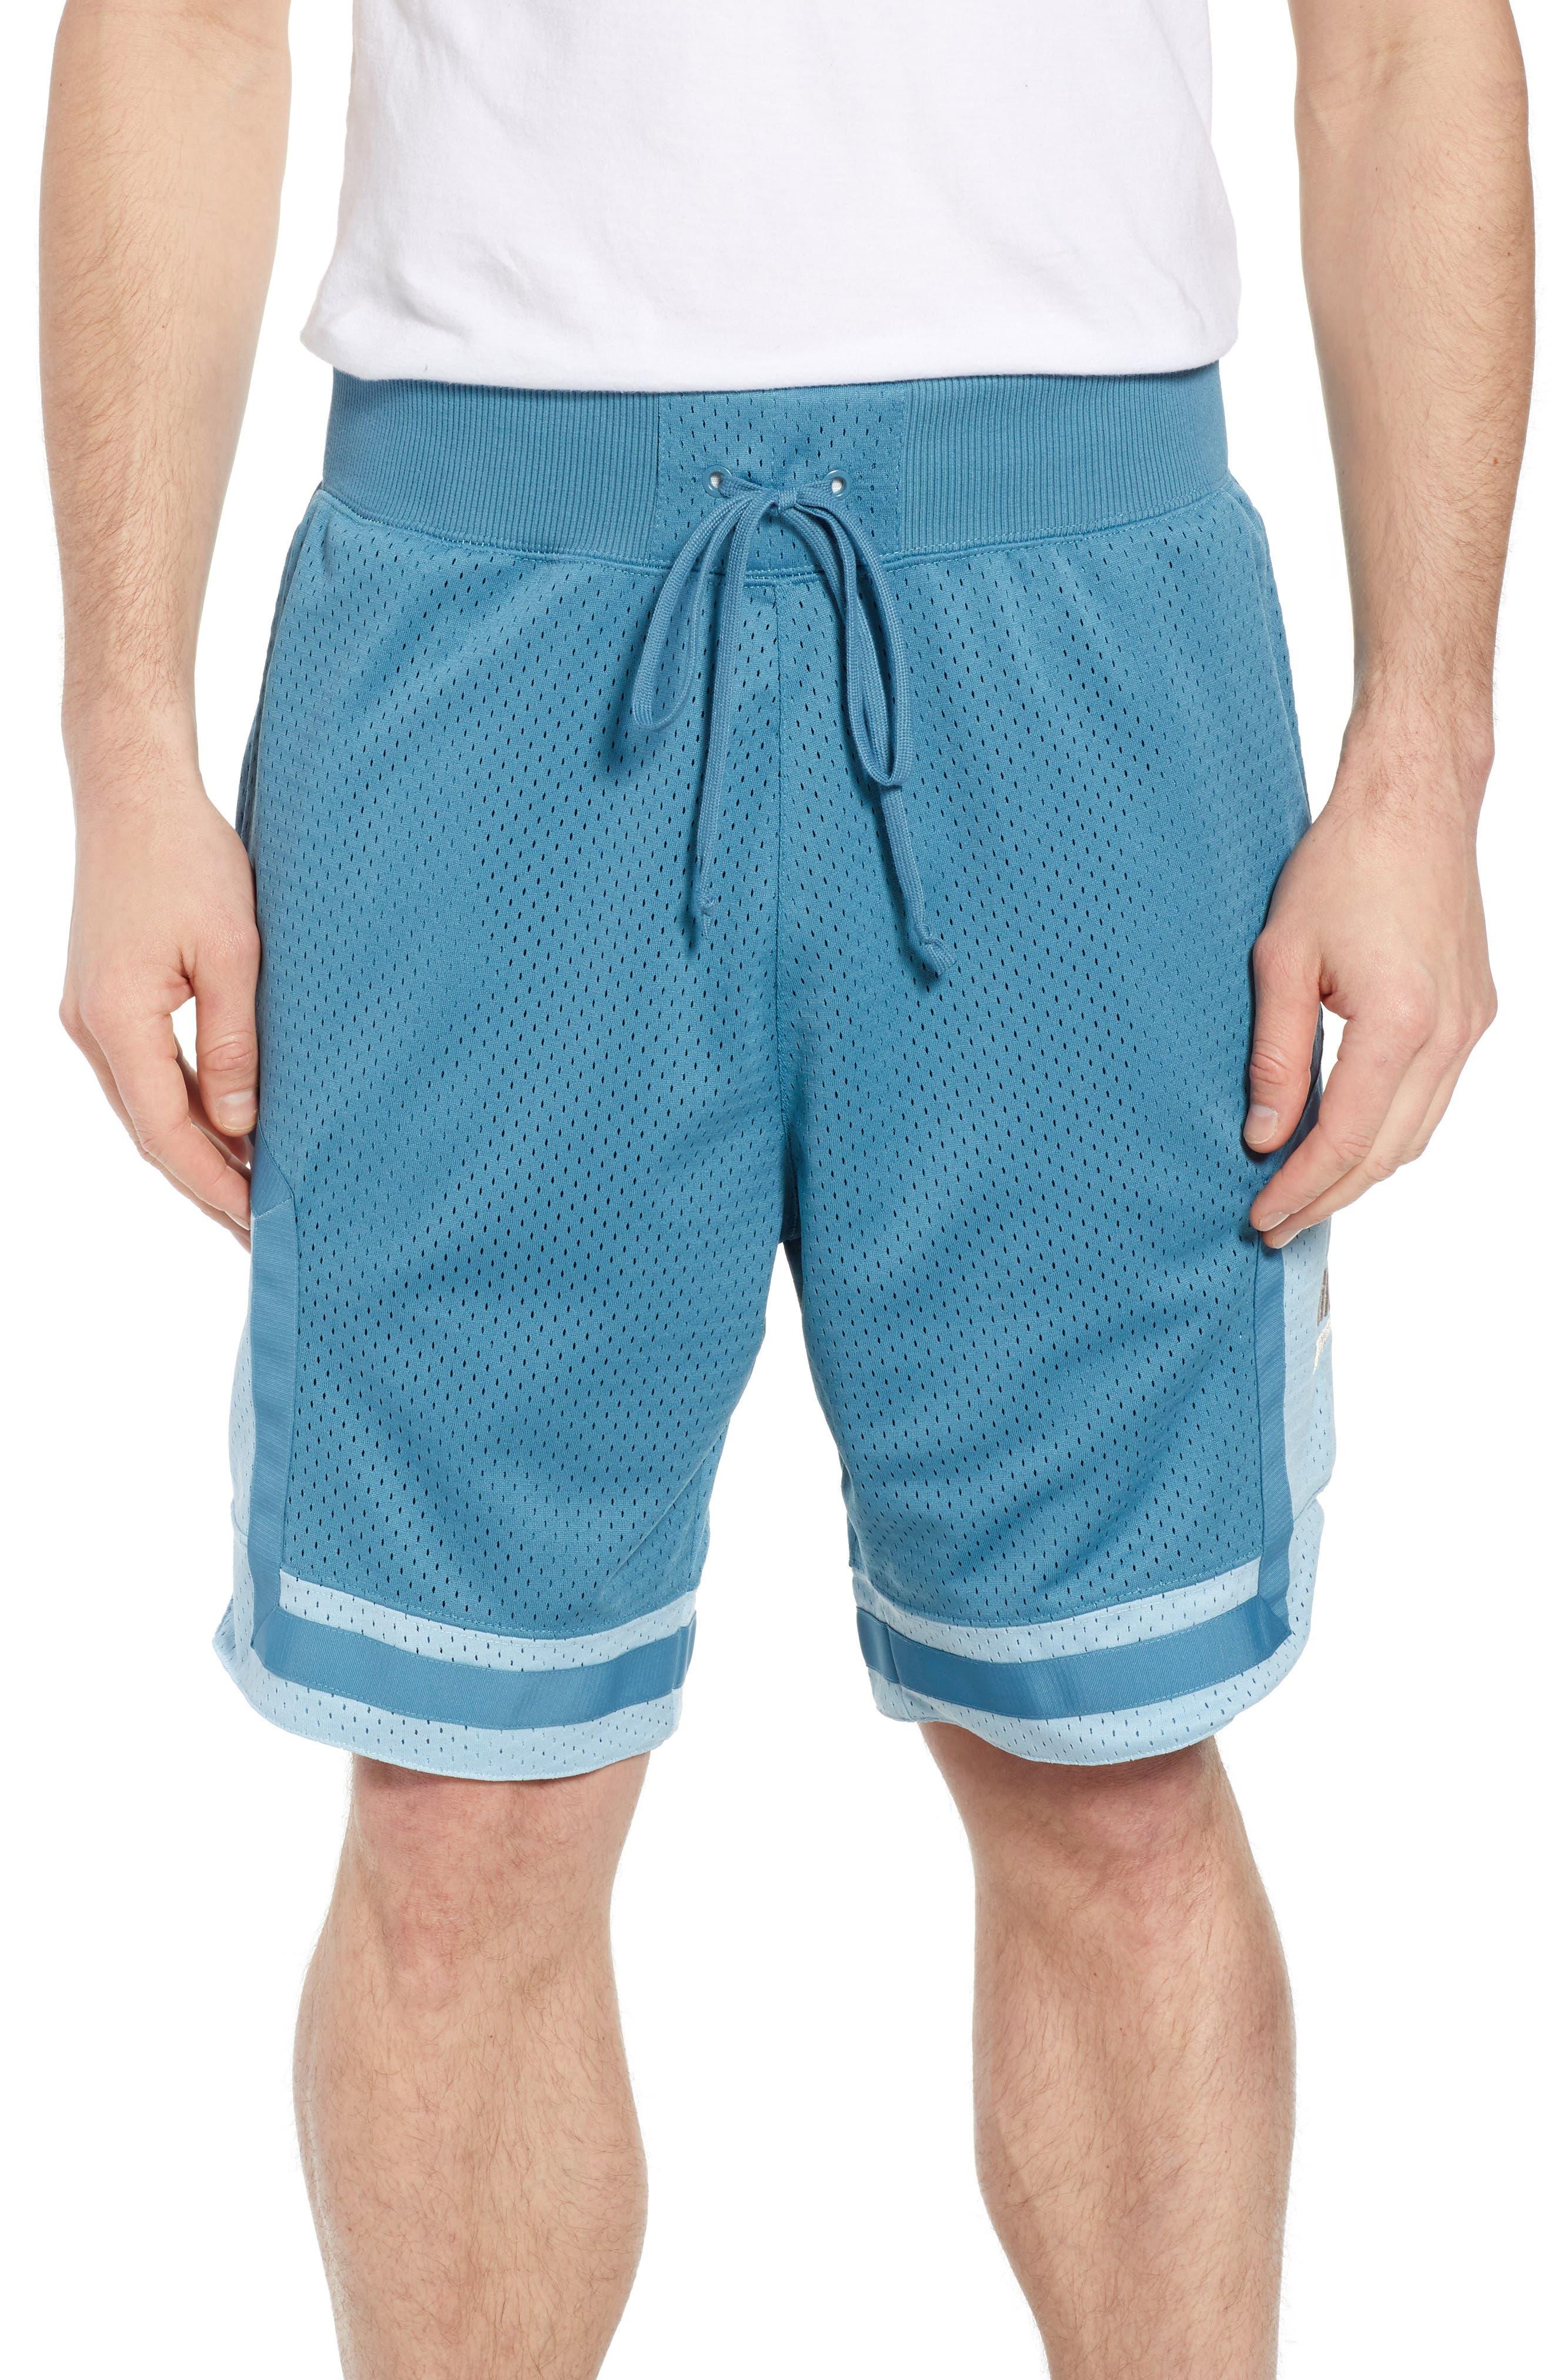 NSW AF1 Shorts,                             Main thumbnail 1, color,                             AQUA/ OCEAN BLISS/ OREWOOD